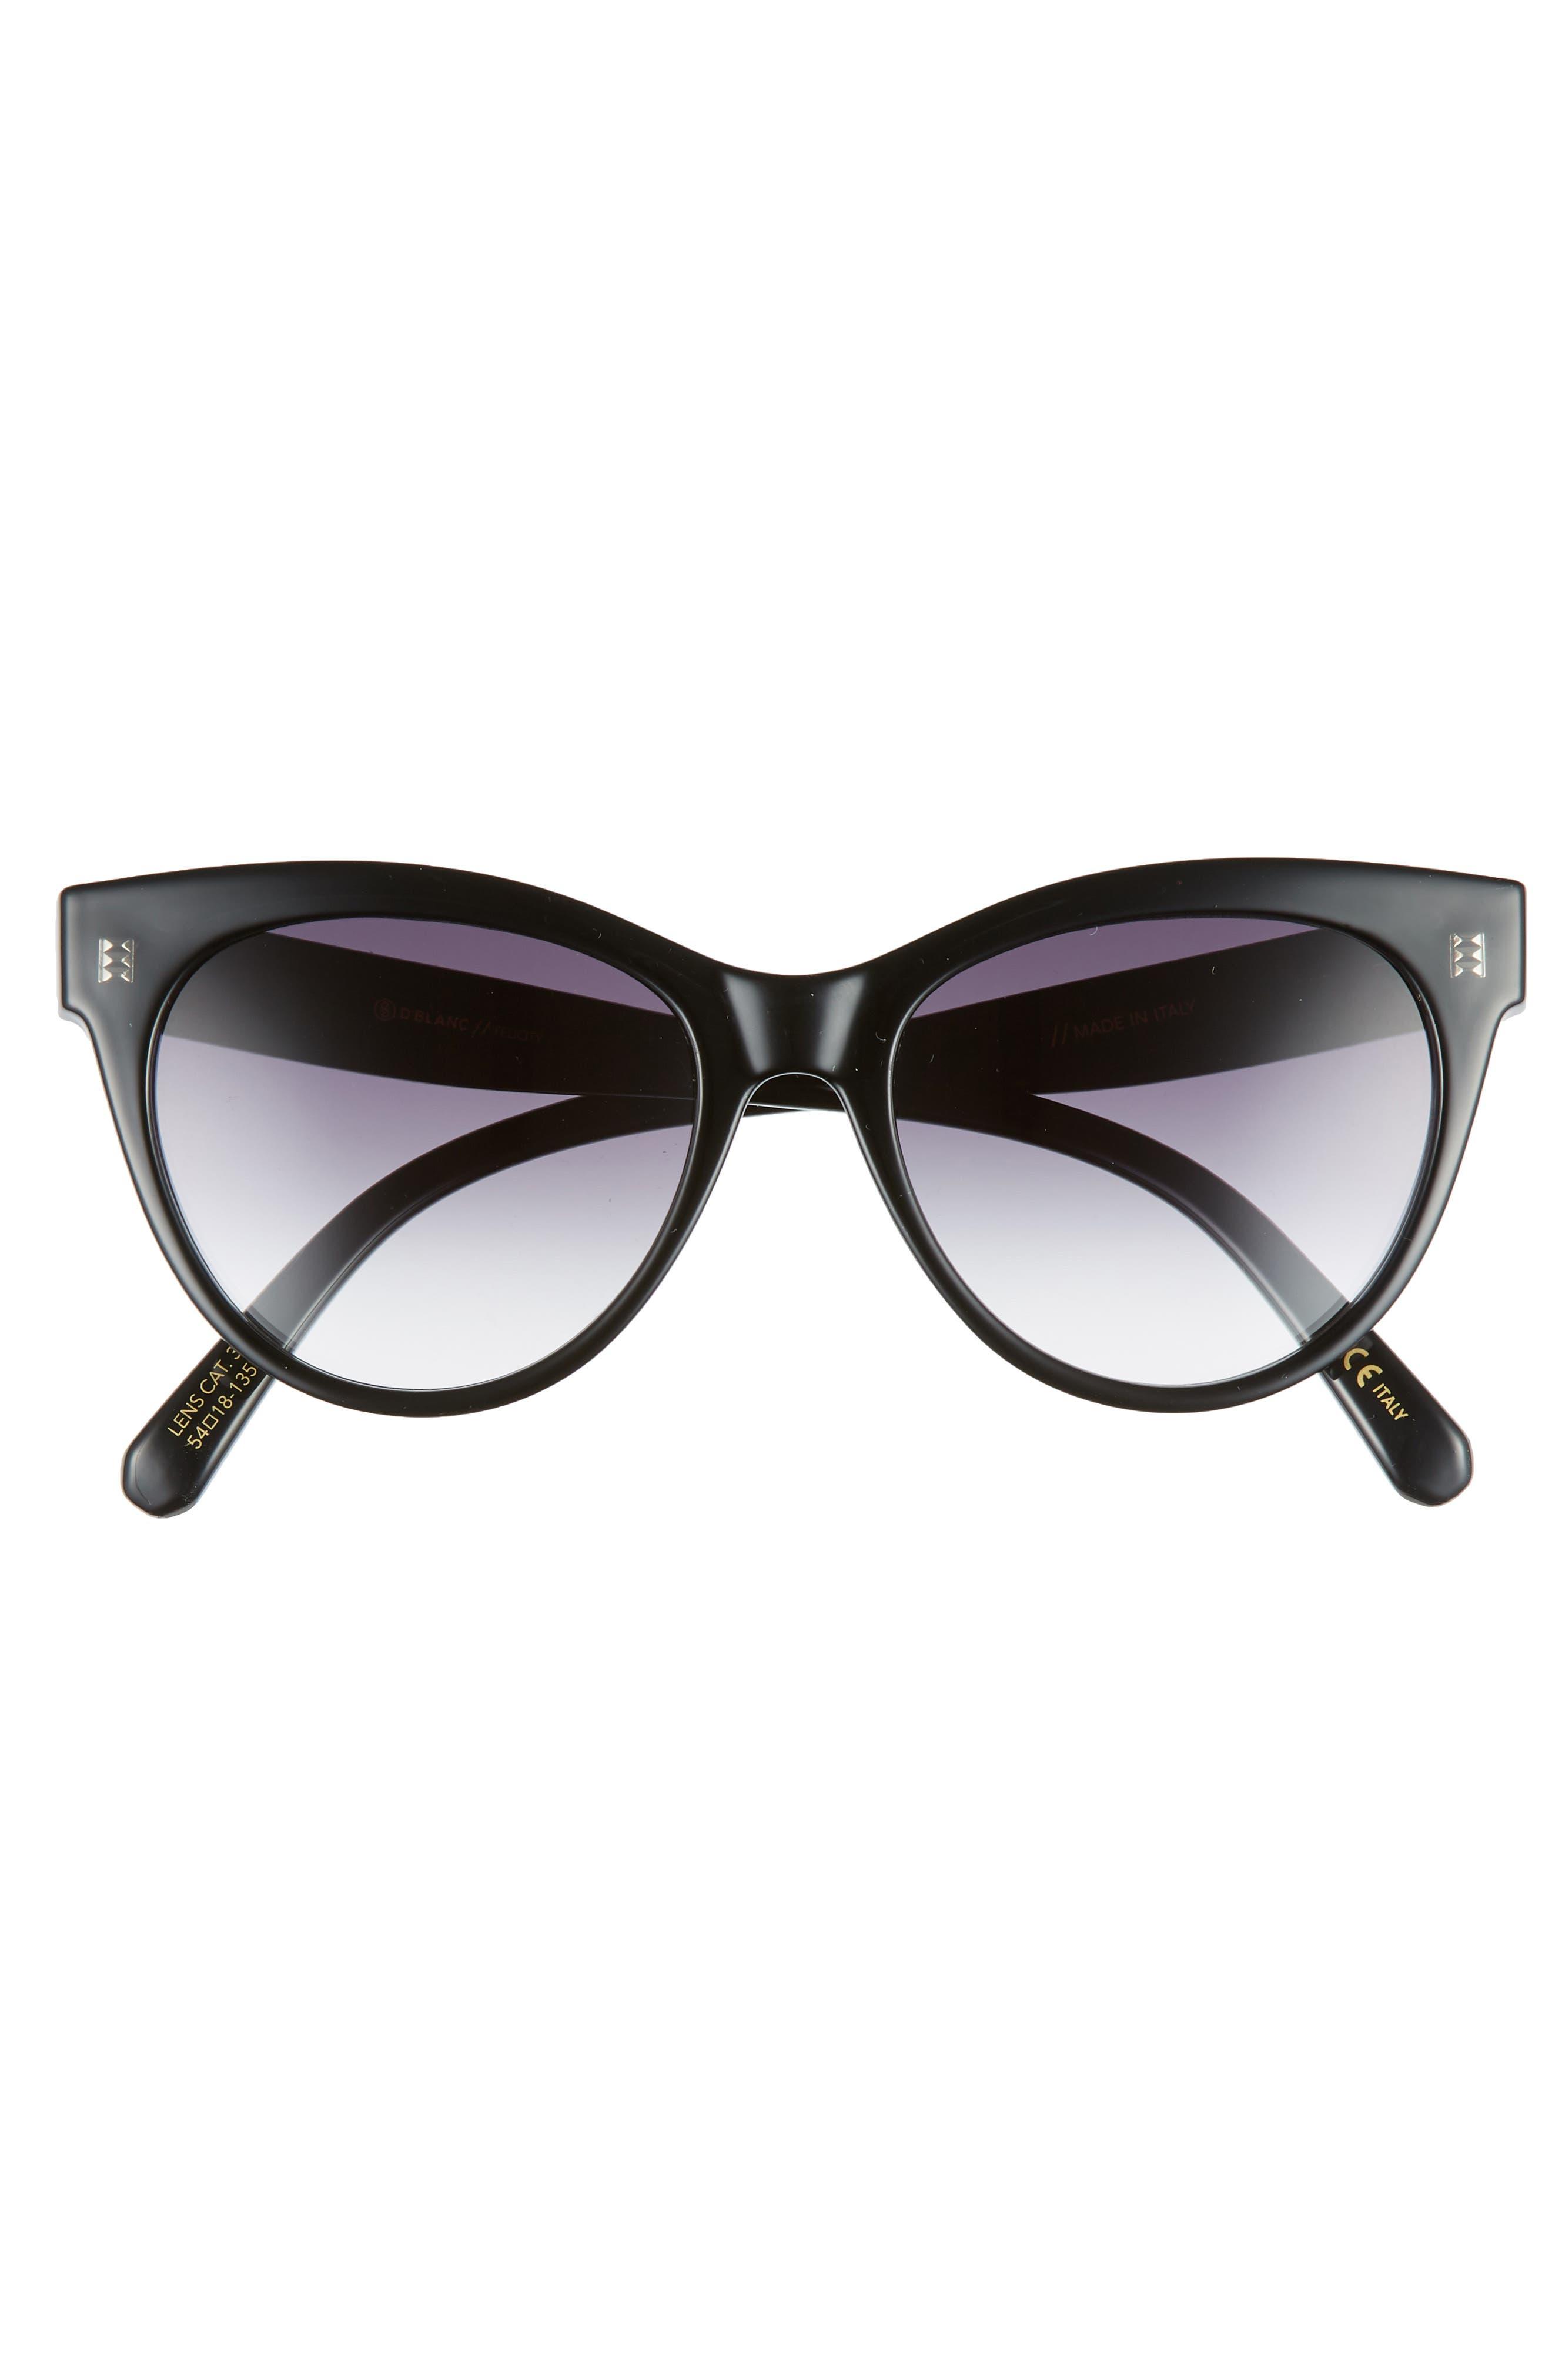 D'BLANC Felicity 54mm Cat Eye Sunglasses,                             Alternate thumbnail 3, color,                             001